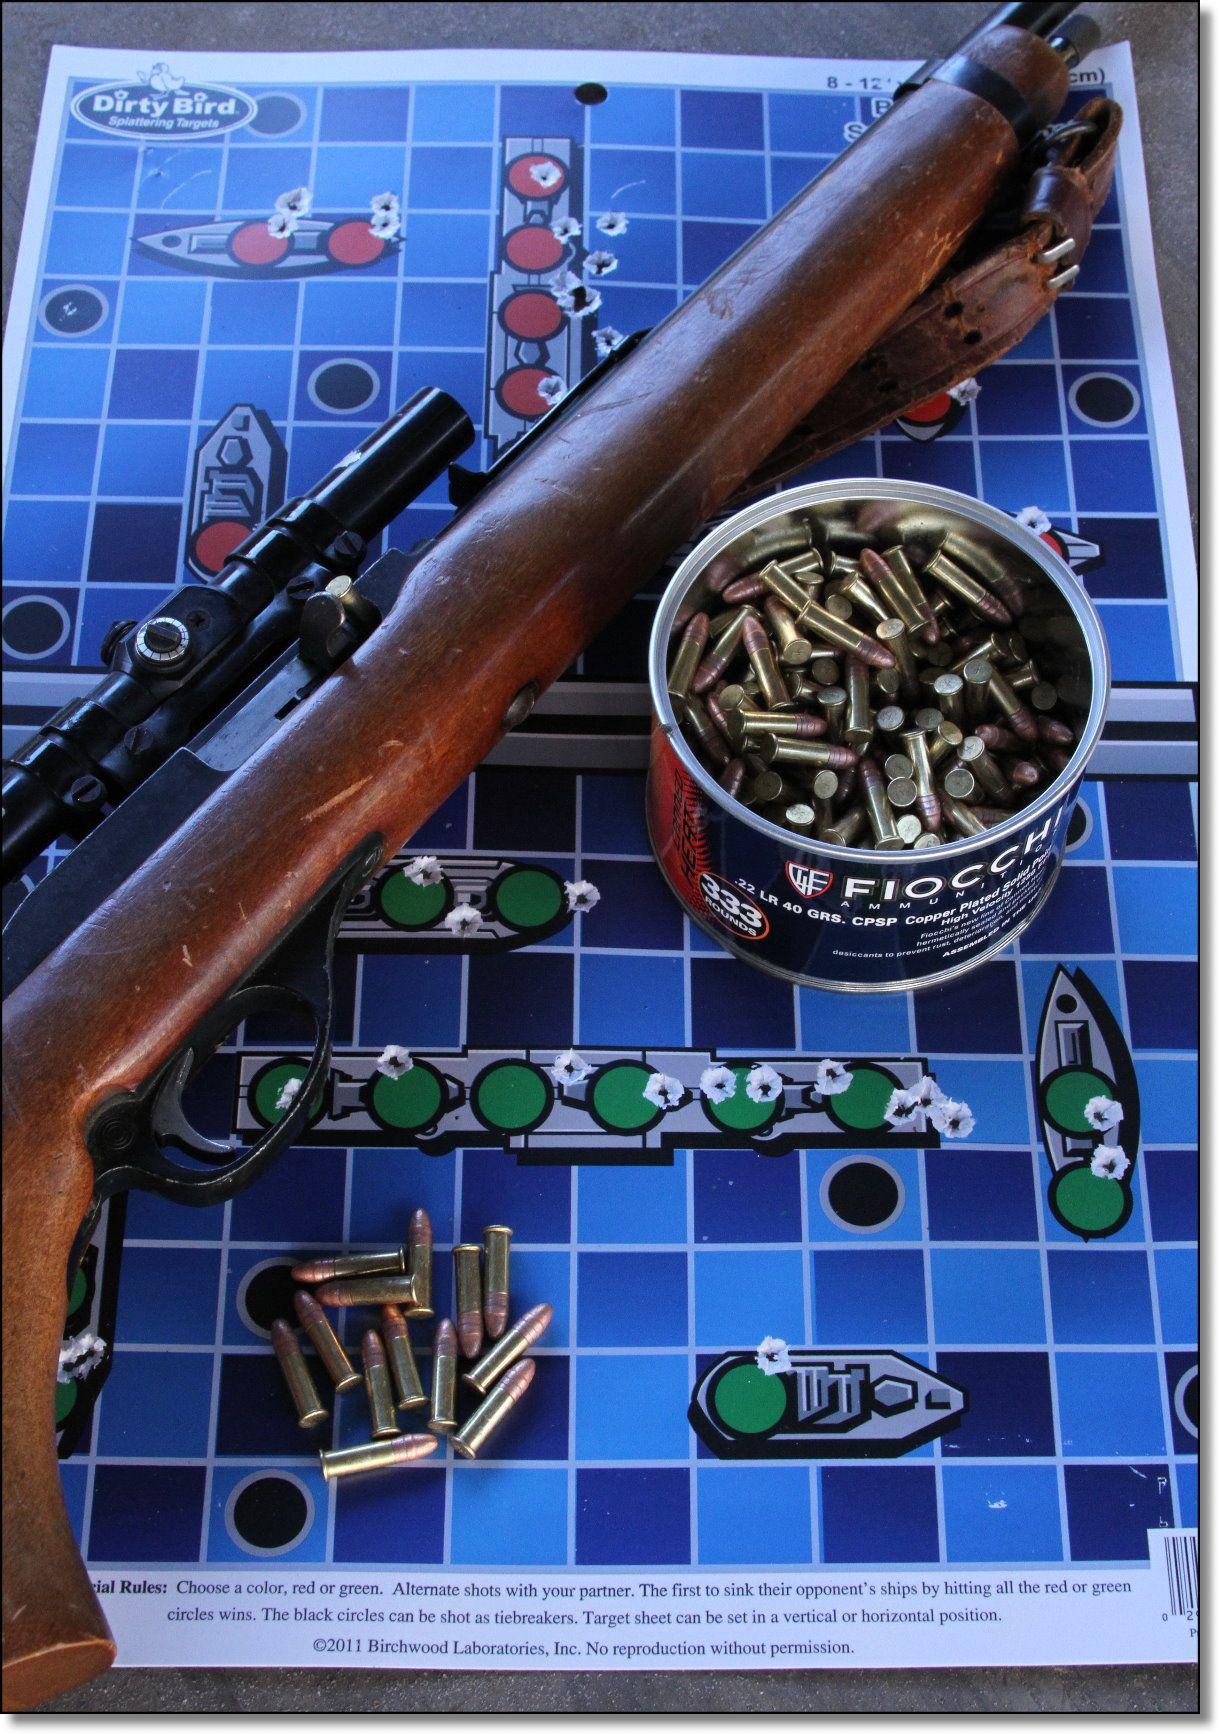 Battles at Sea 12x18 Game Targets  http://sport.birchwoodcasey.com/Targets/TargetDetails.aspx?ProductID=b545fd10-a522-470e-9630-7fa712b212f3#